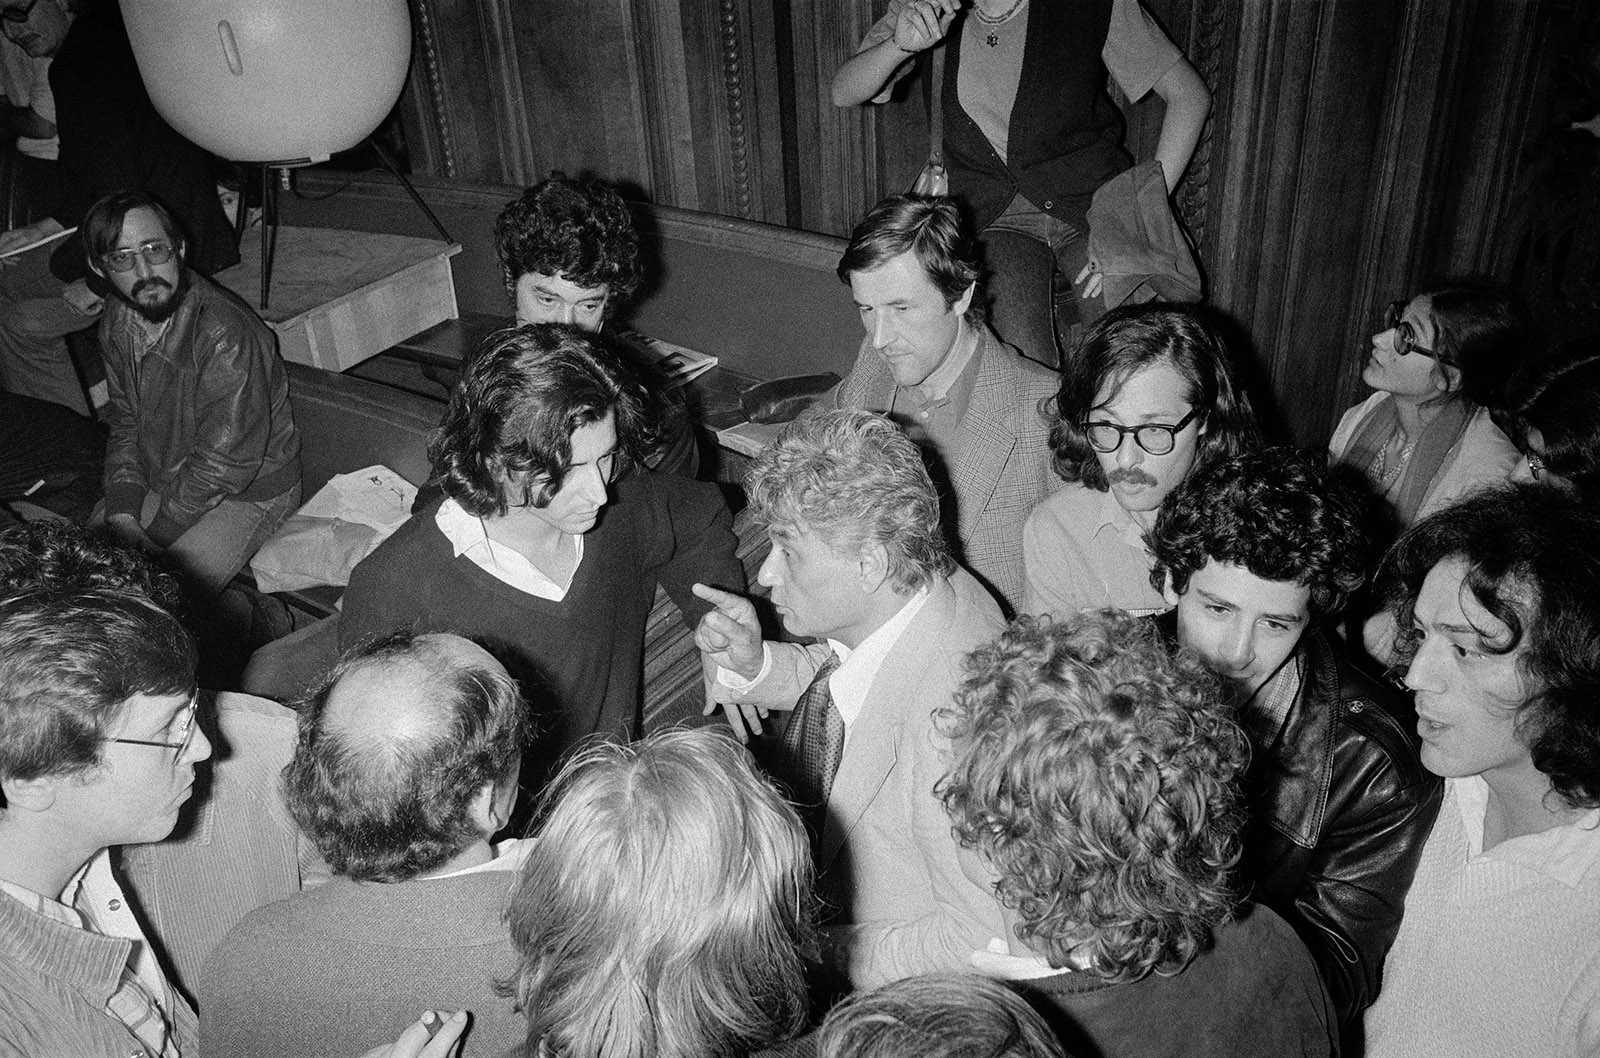 Jacques Derrida (center) and Bernard-Henri Lévi at the Sorbonne, 1979